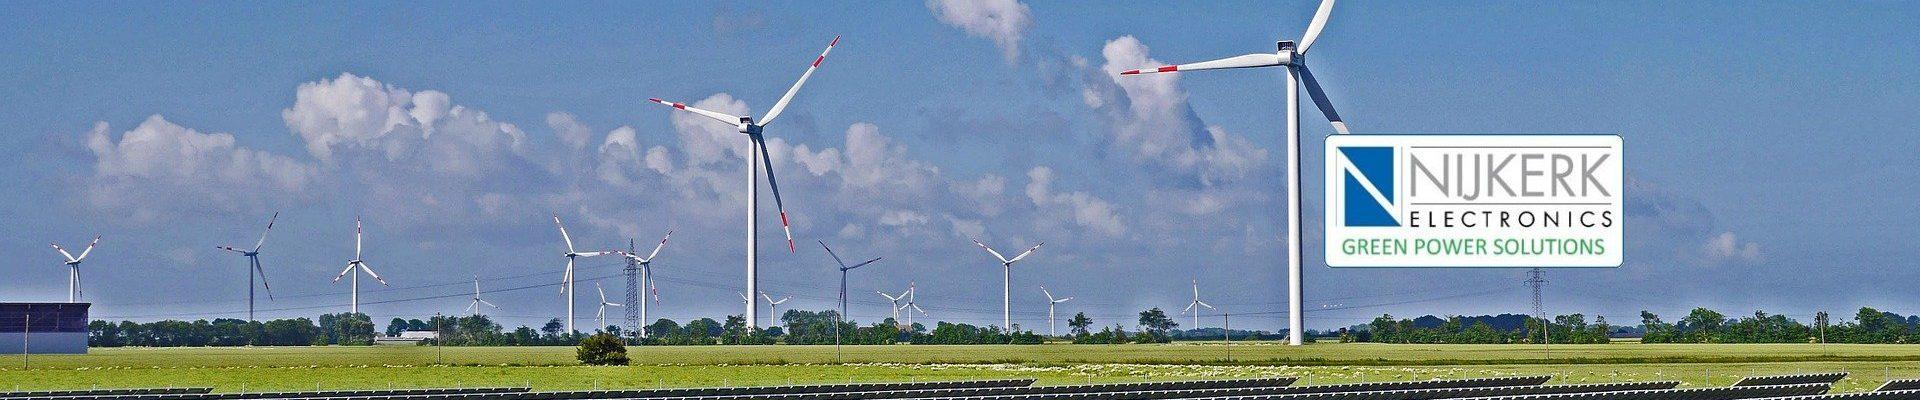 solarpark nijkerk green power